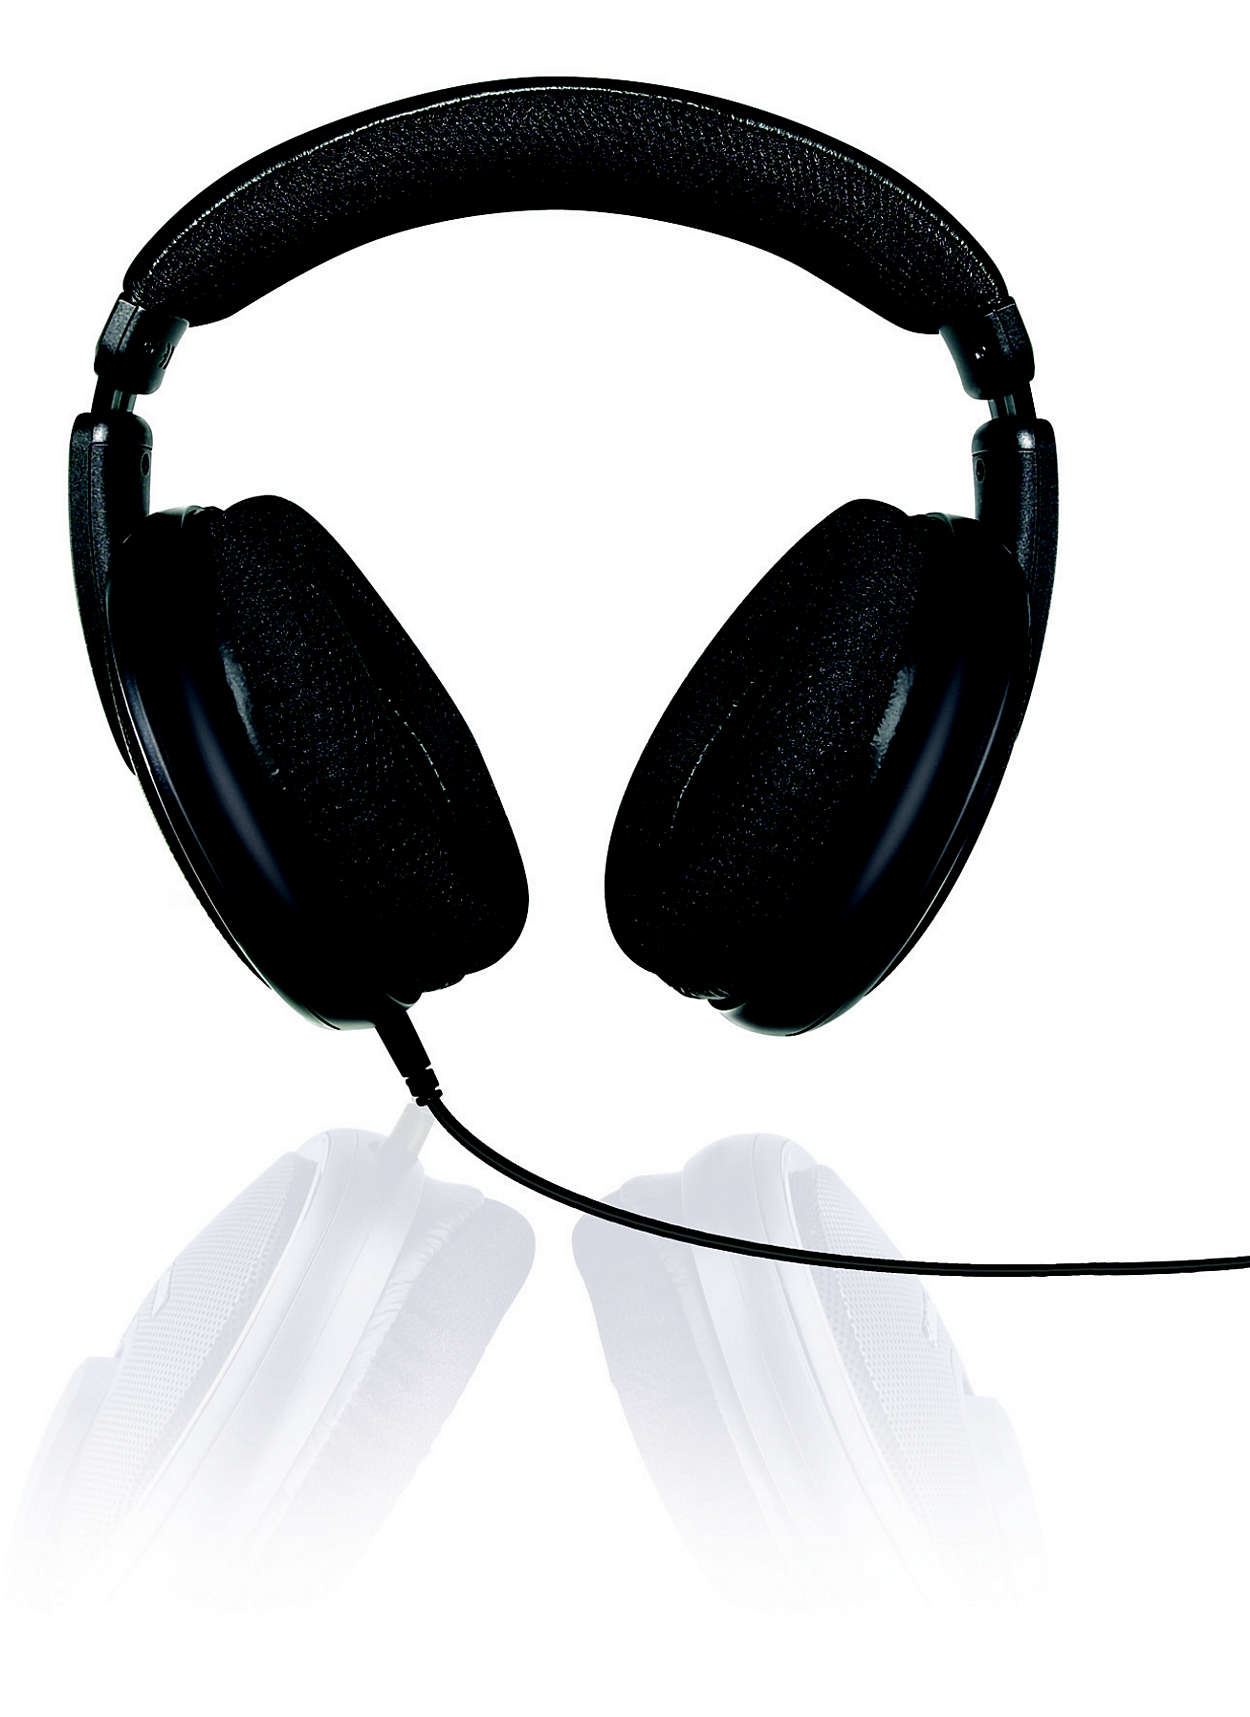 Dokonale čistý zvuk